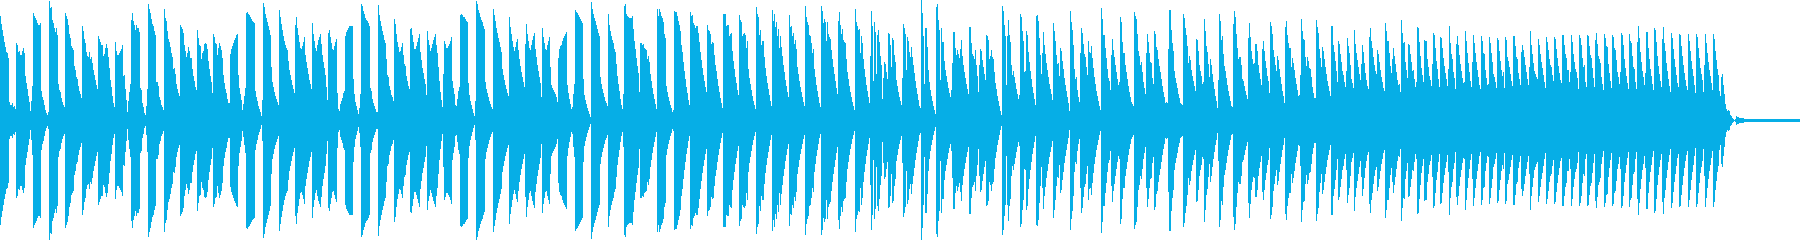 AMGアナログFX3の再生済みの波形